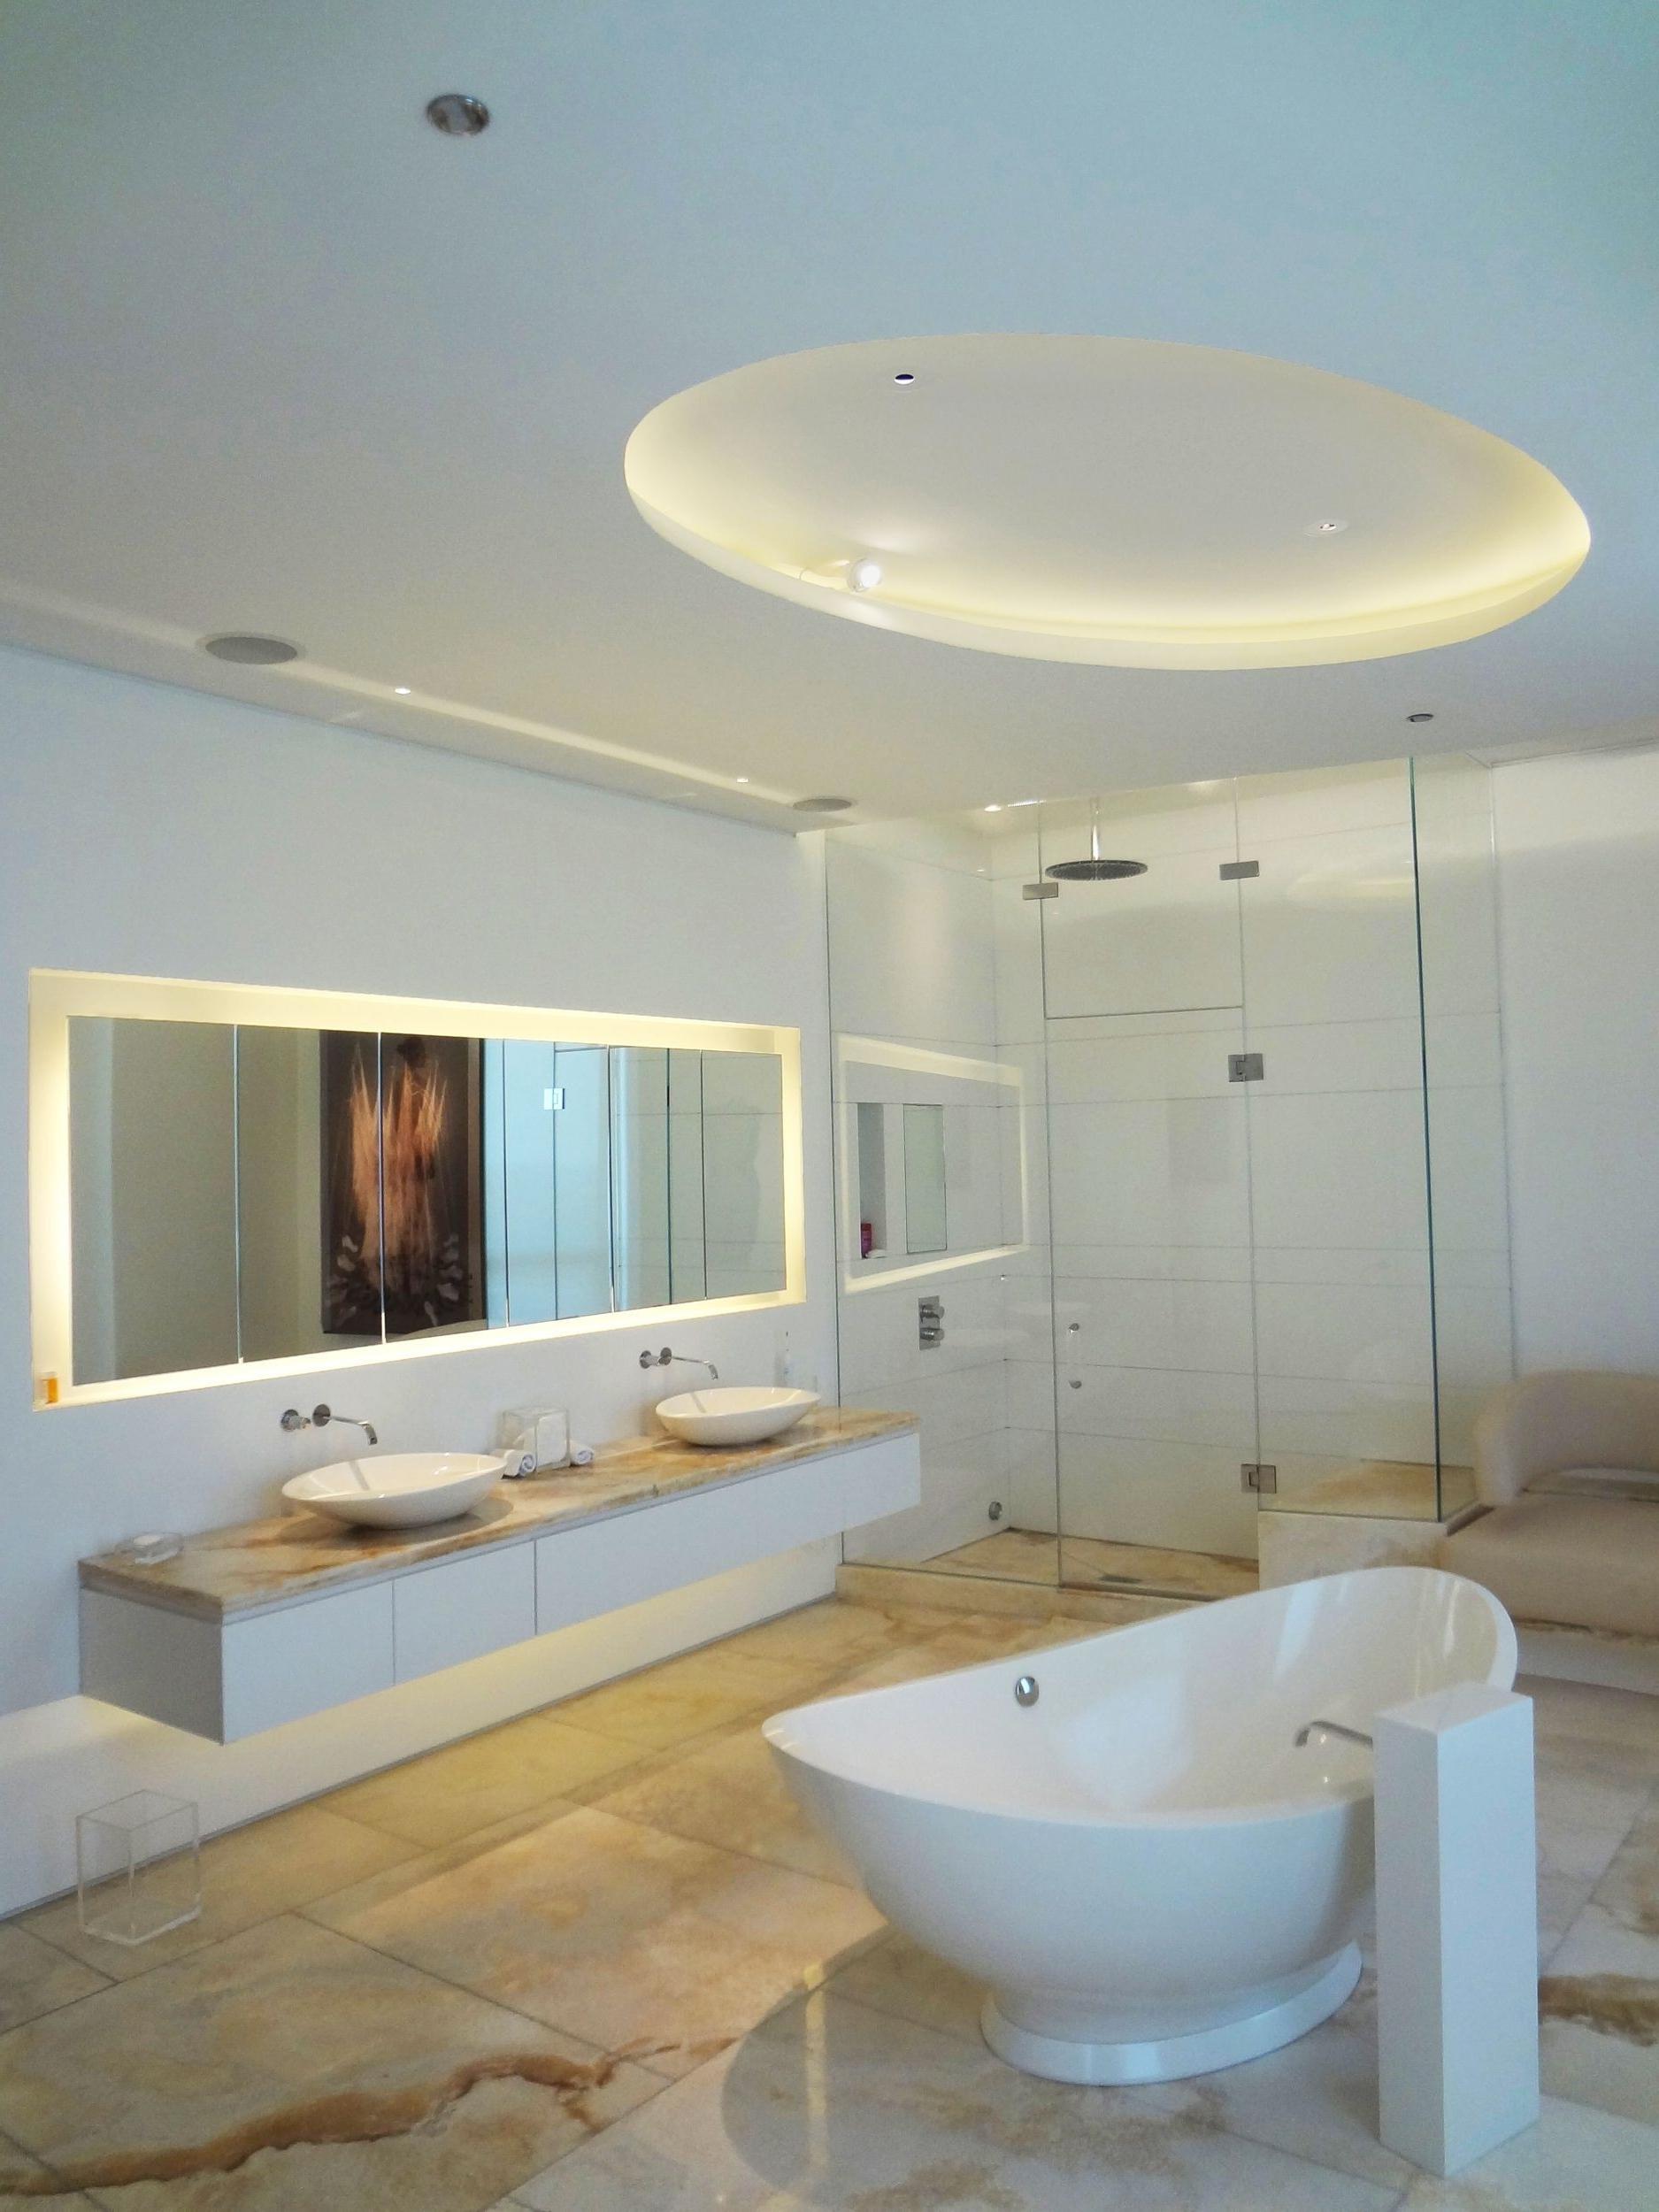 Bathroom Lighting Chandeliers Throughout Newest Incredible Chandelier Bathroom Lighting Lighting Bathroom Lighting (View 18 of 20)